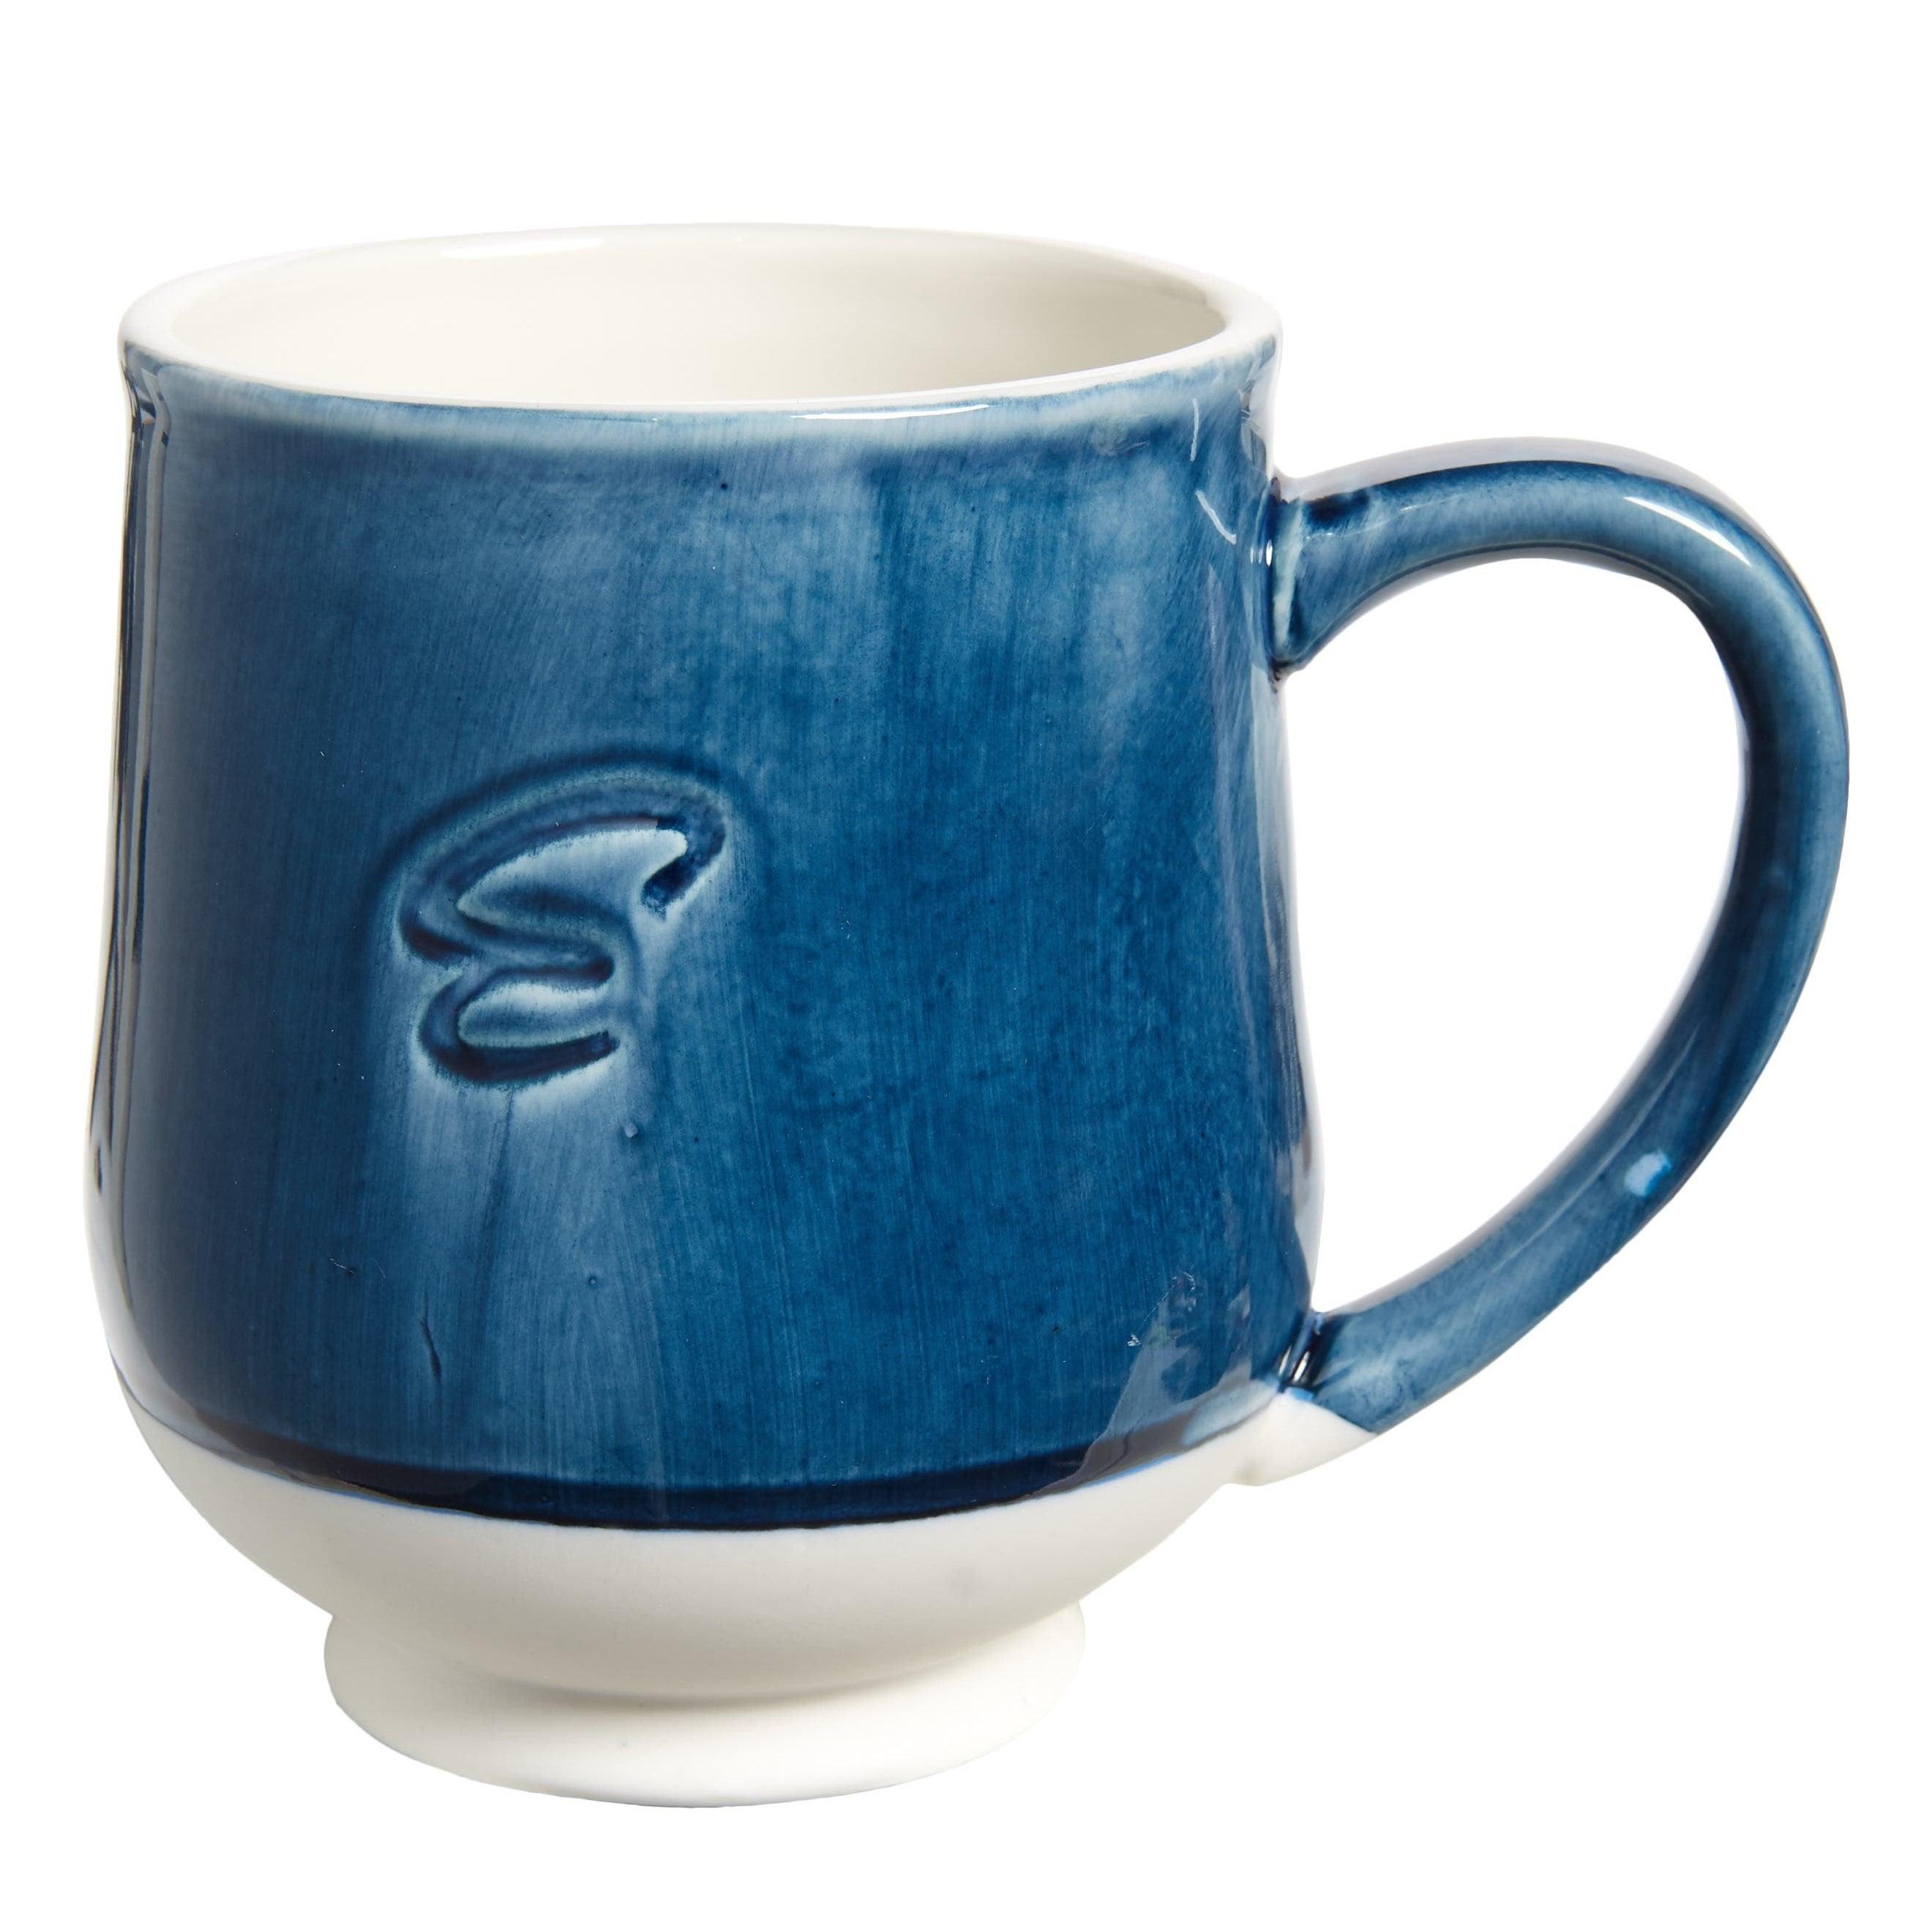 blue monogrammed mug with a glaze over it